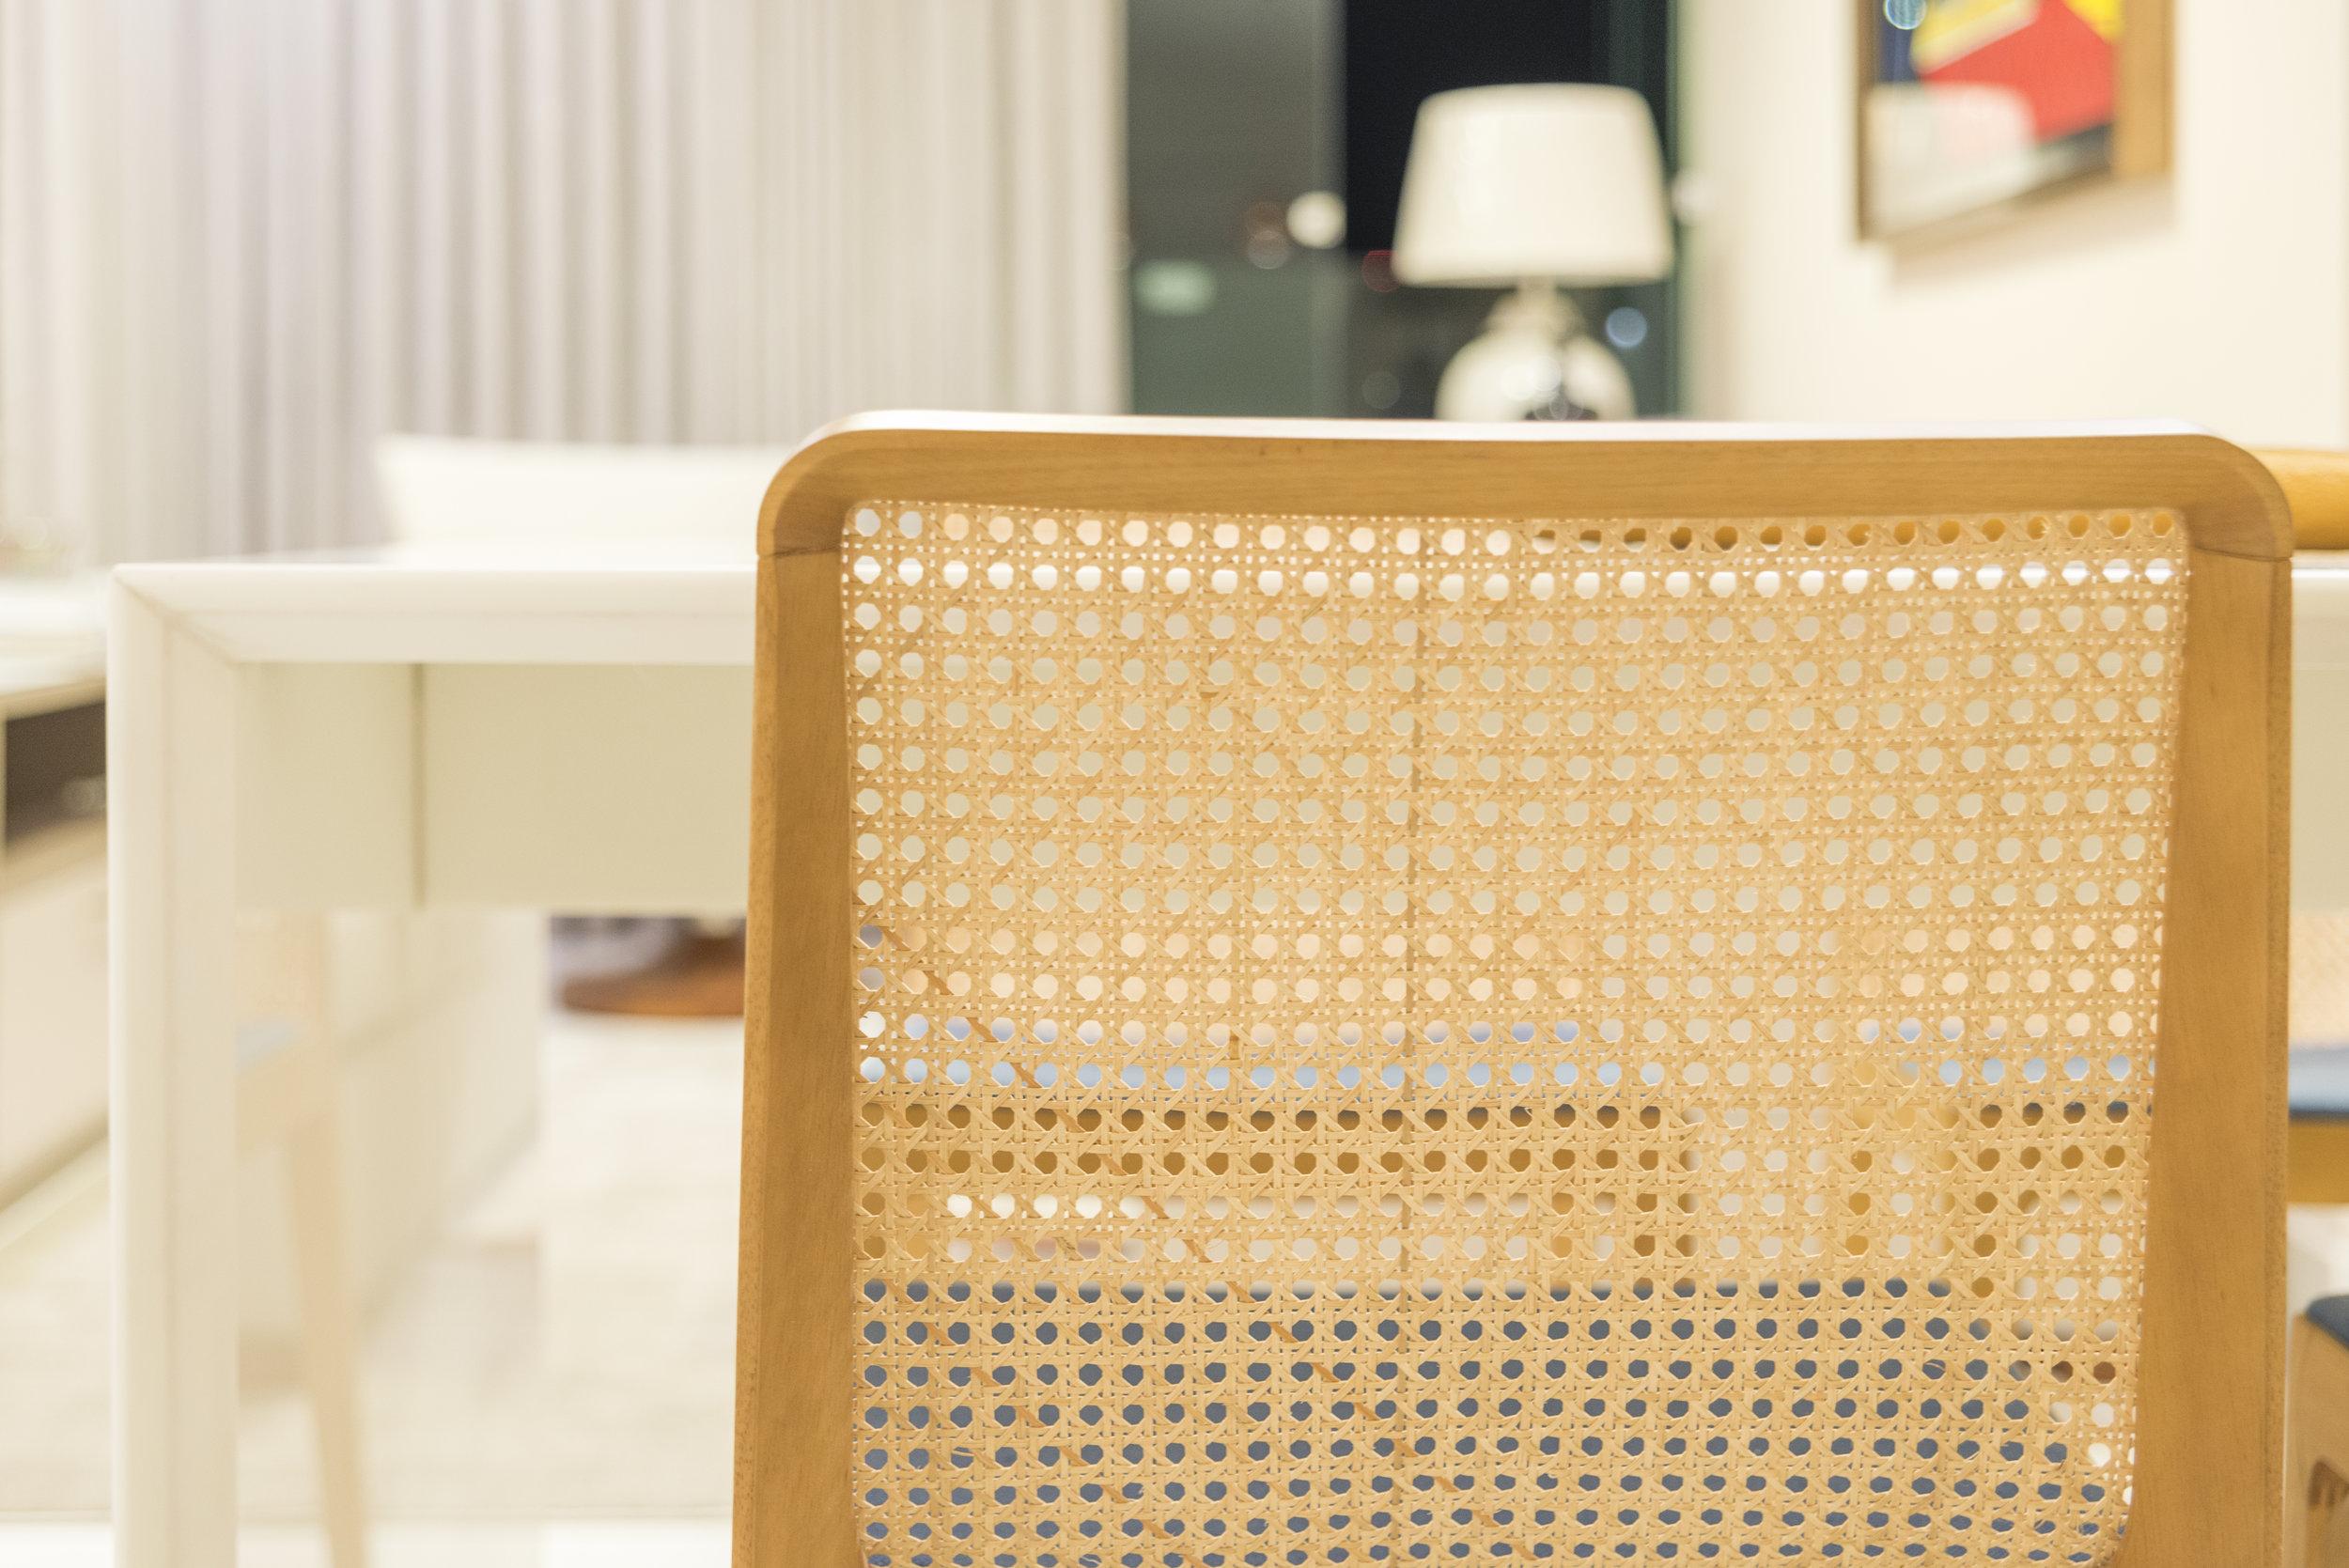 projeto-arquitetonico-robertoindira-duo-arquitetura-apartamentos-estar-011.jpg